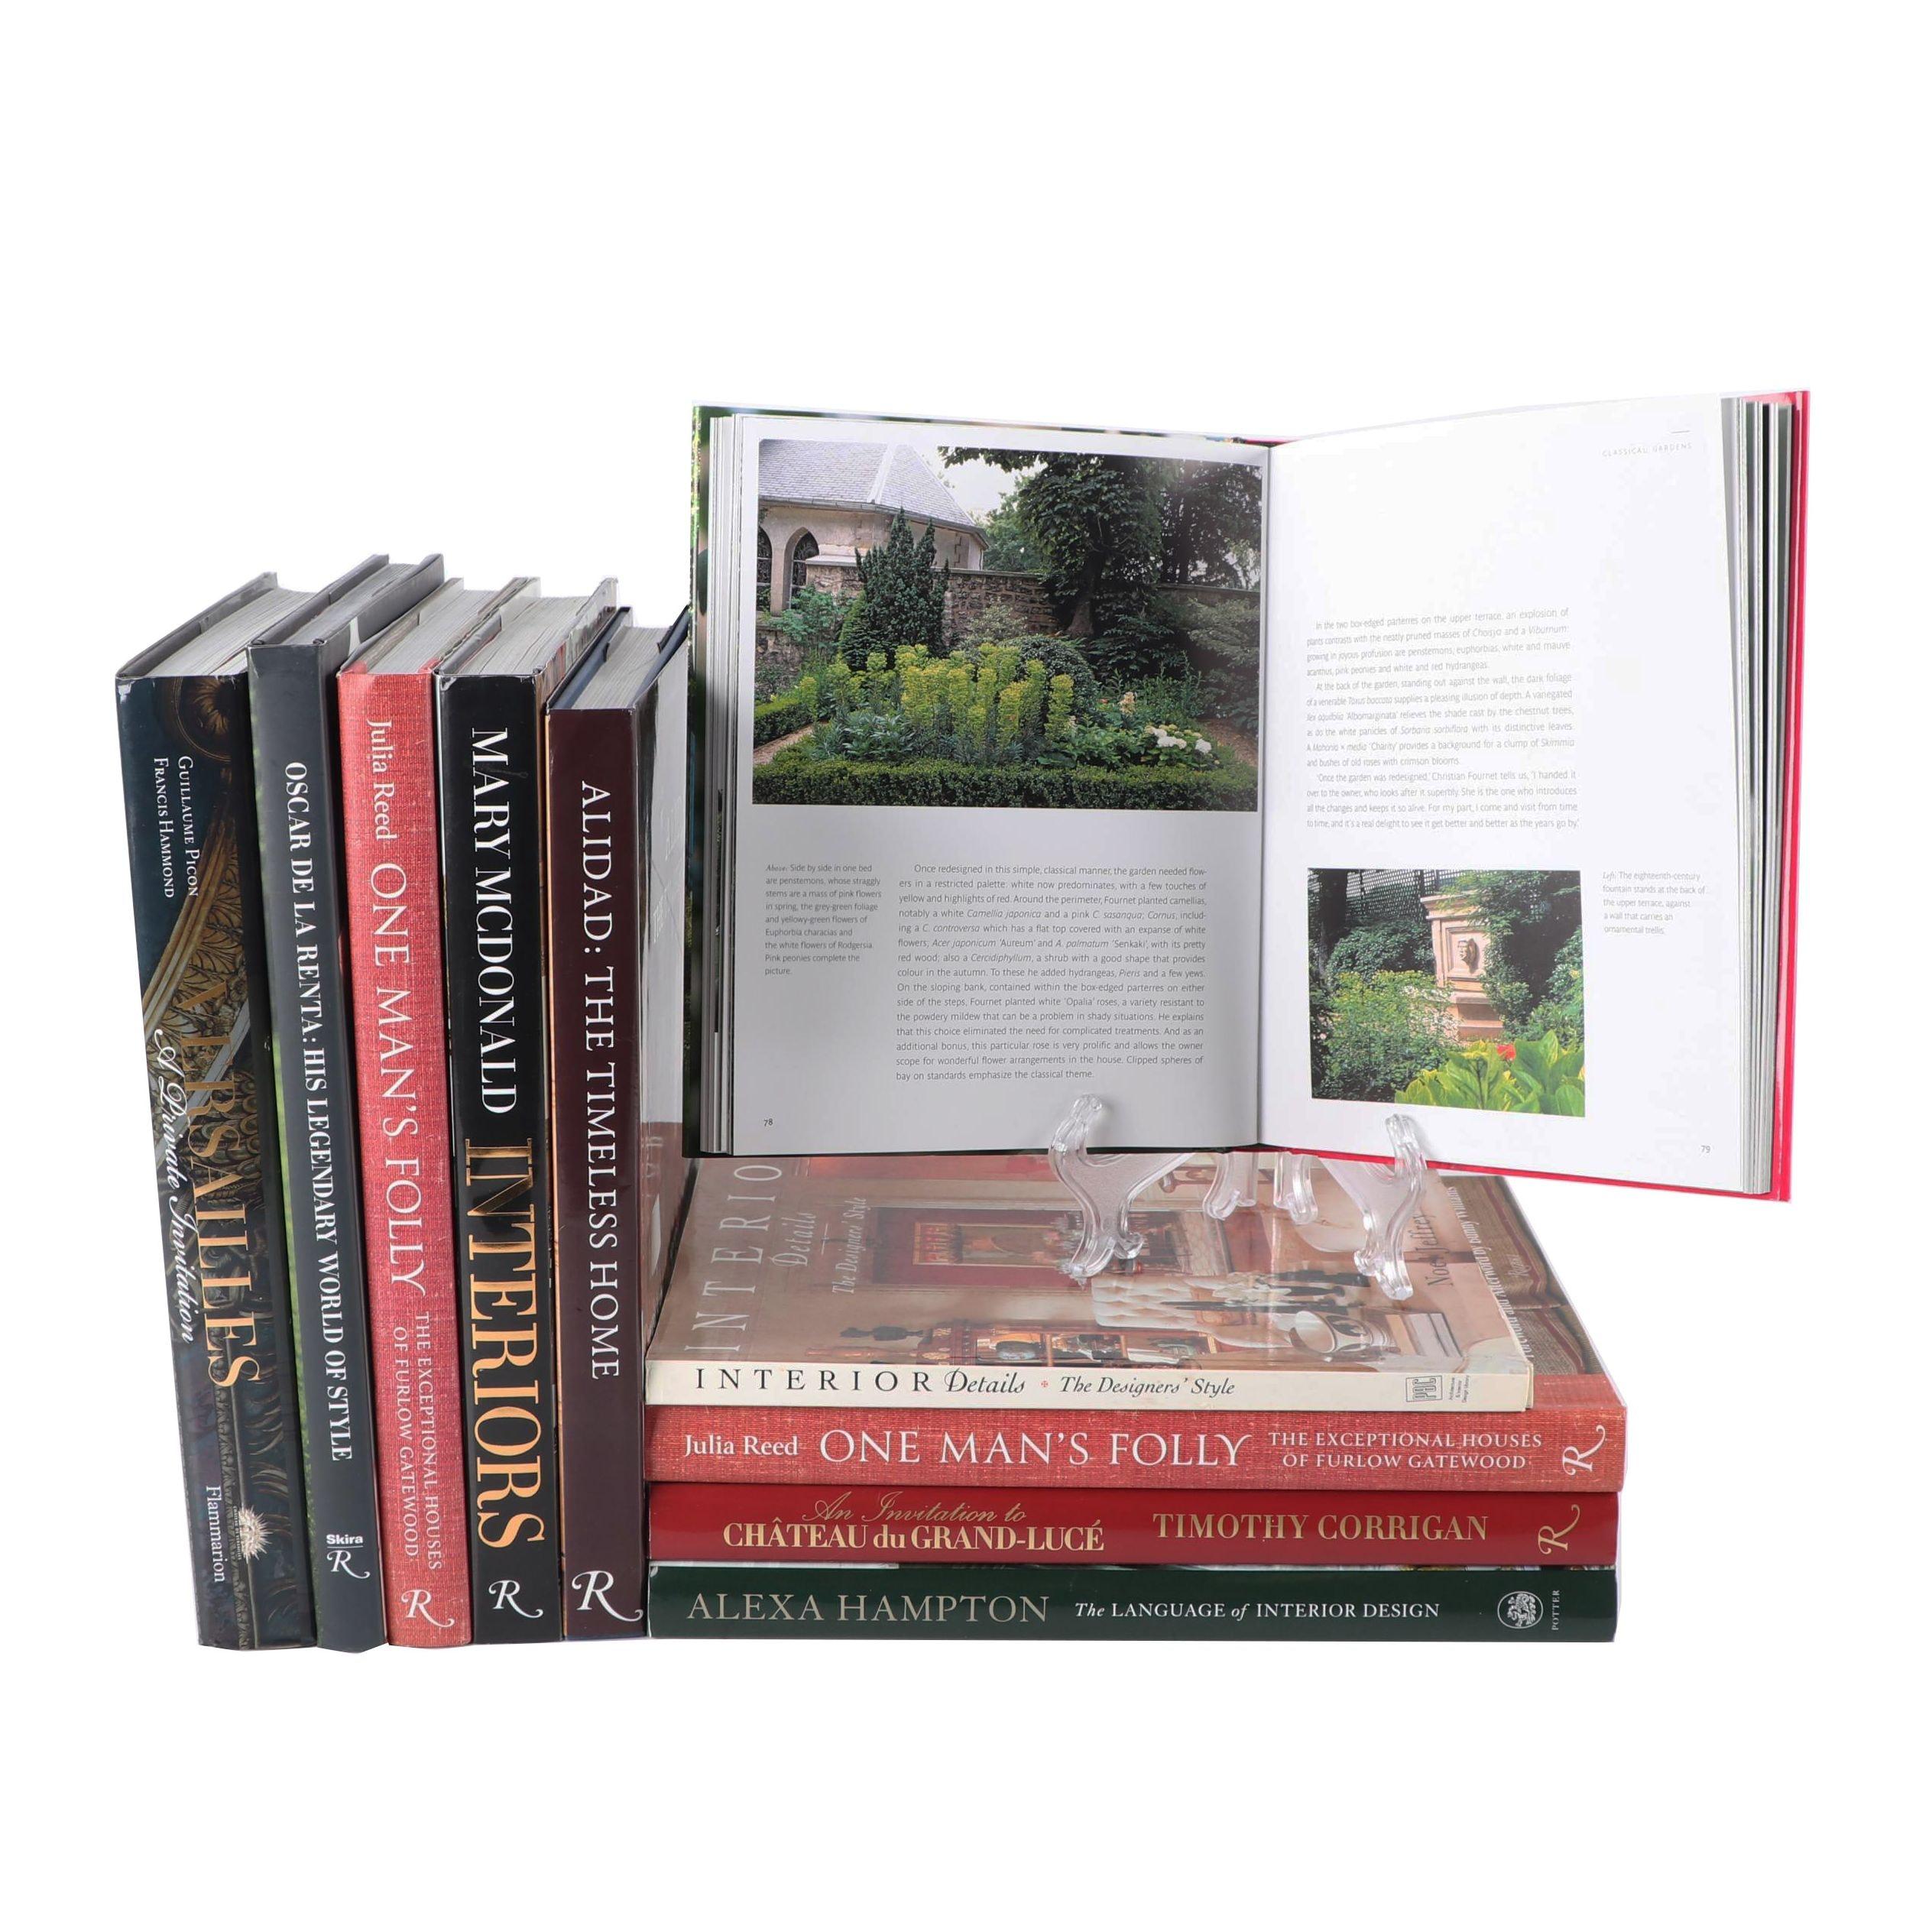 Home Decor and Design Books